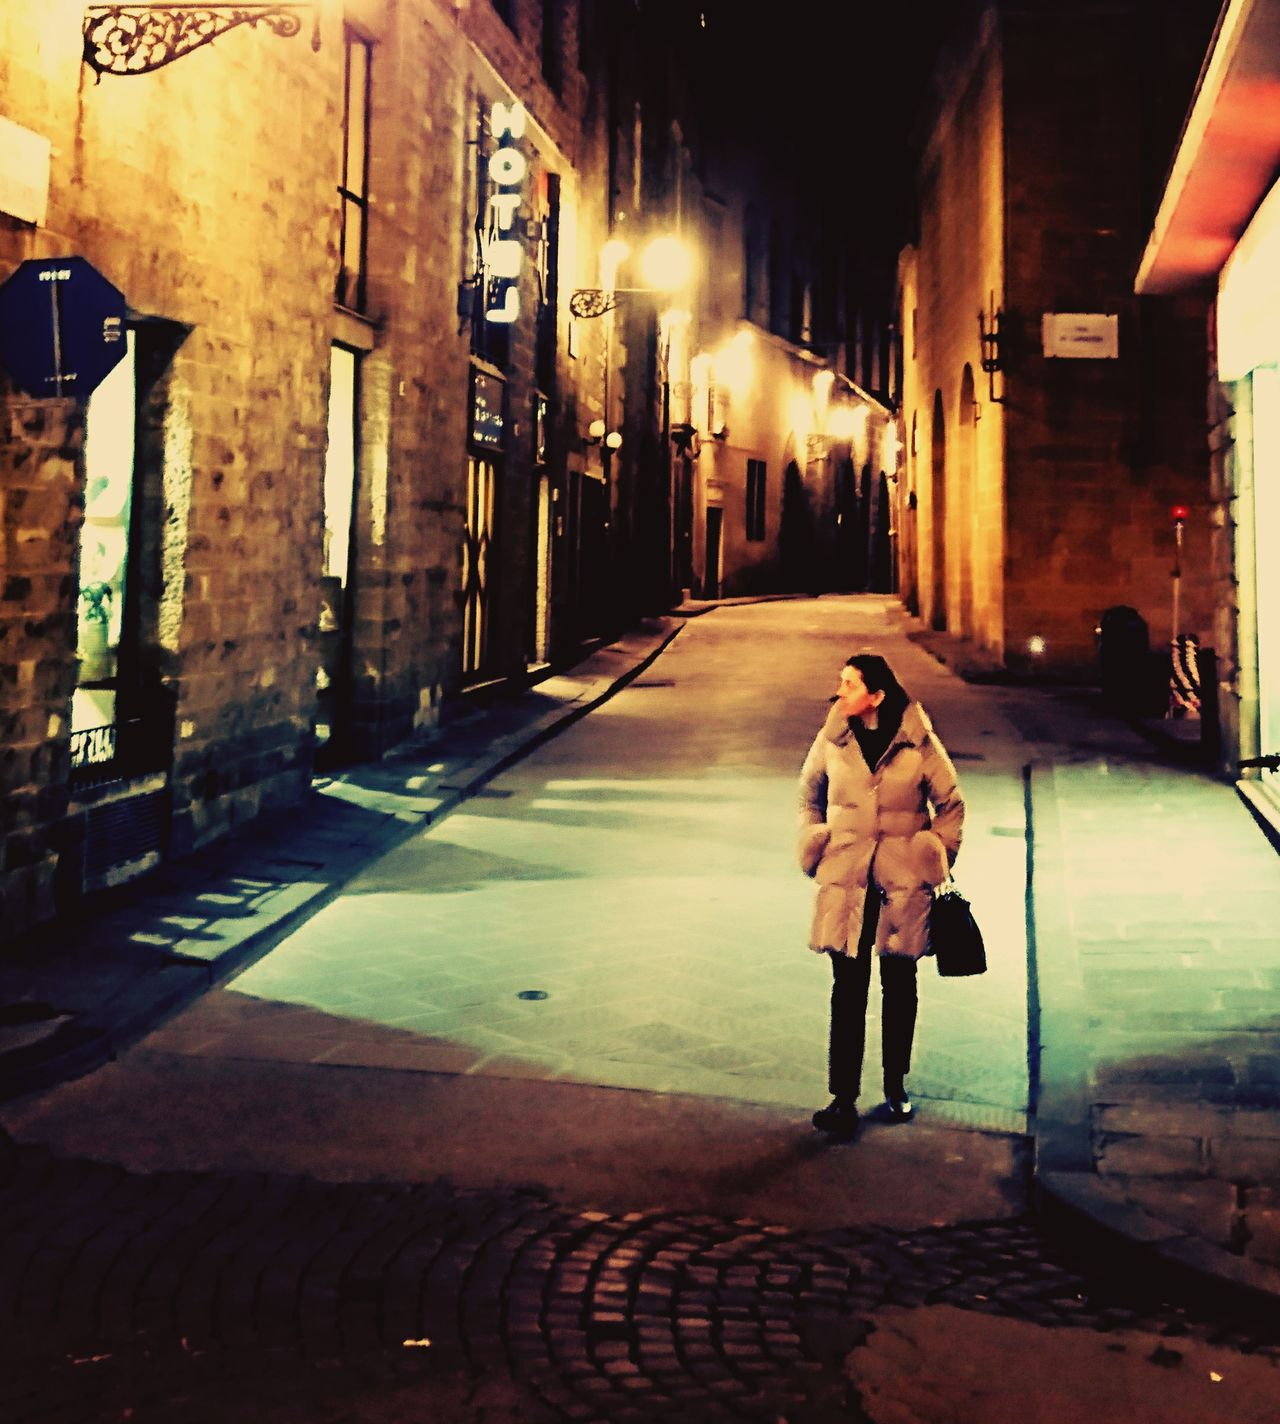 Street Walking Winter Quiet Alley At Night Illuminated City Cityscape